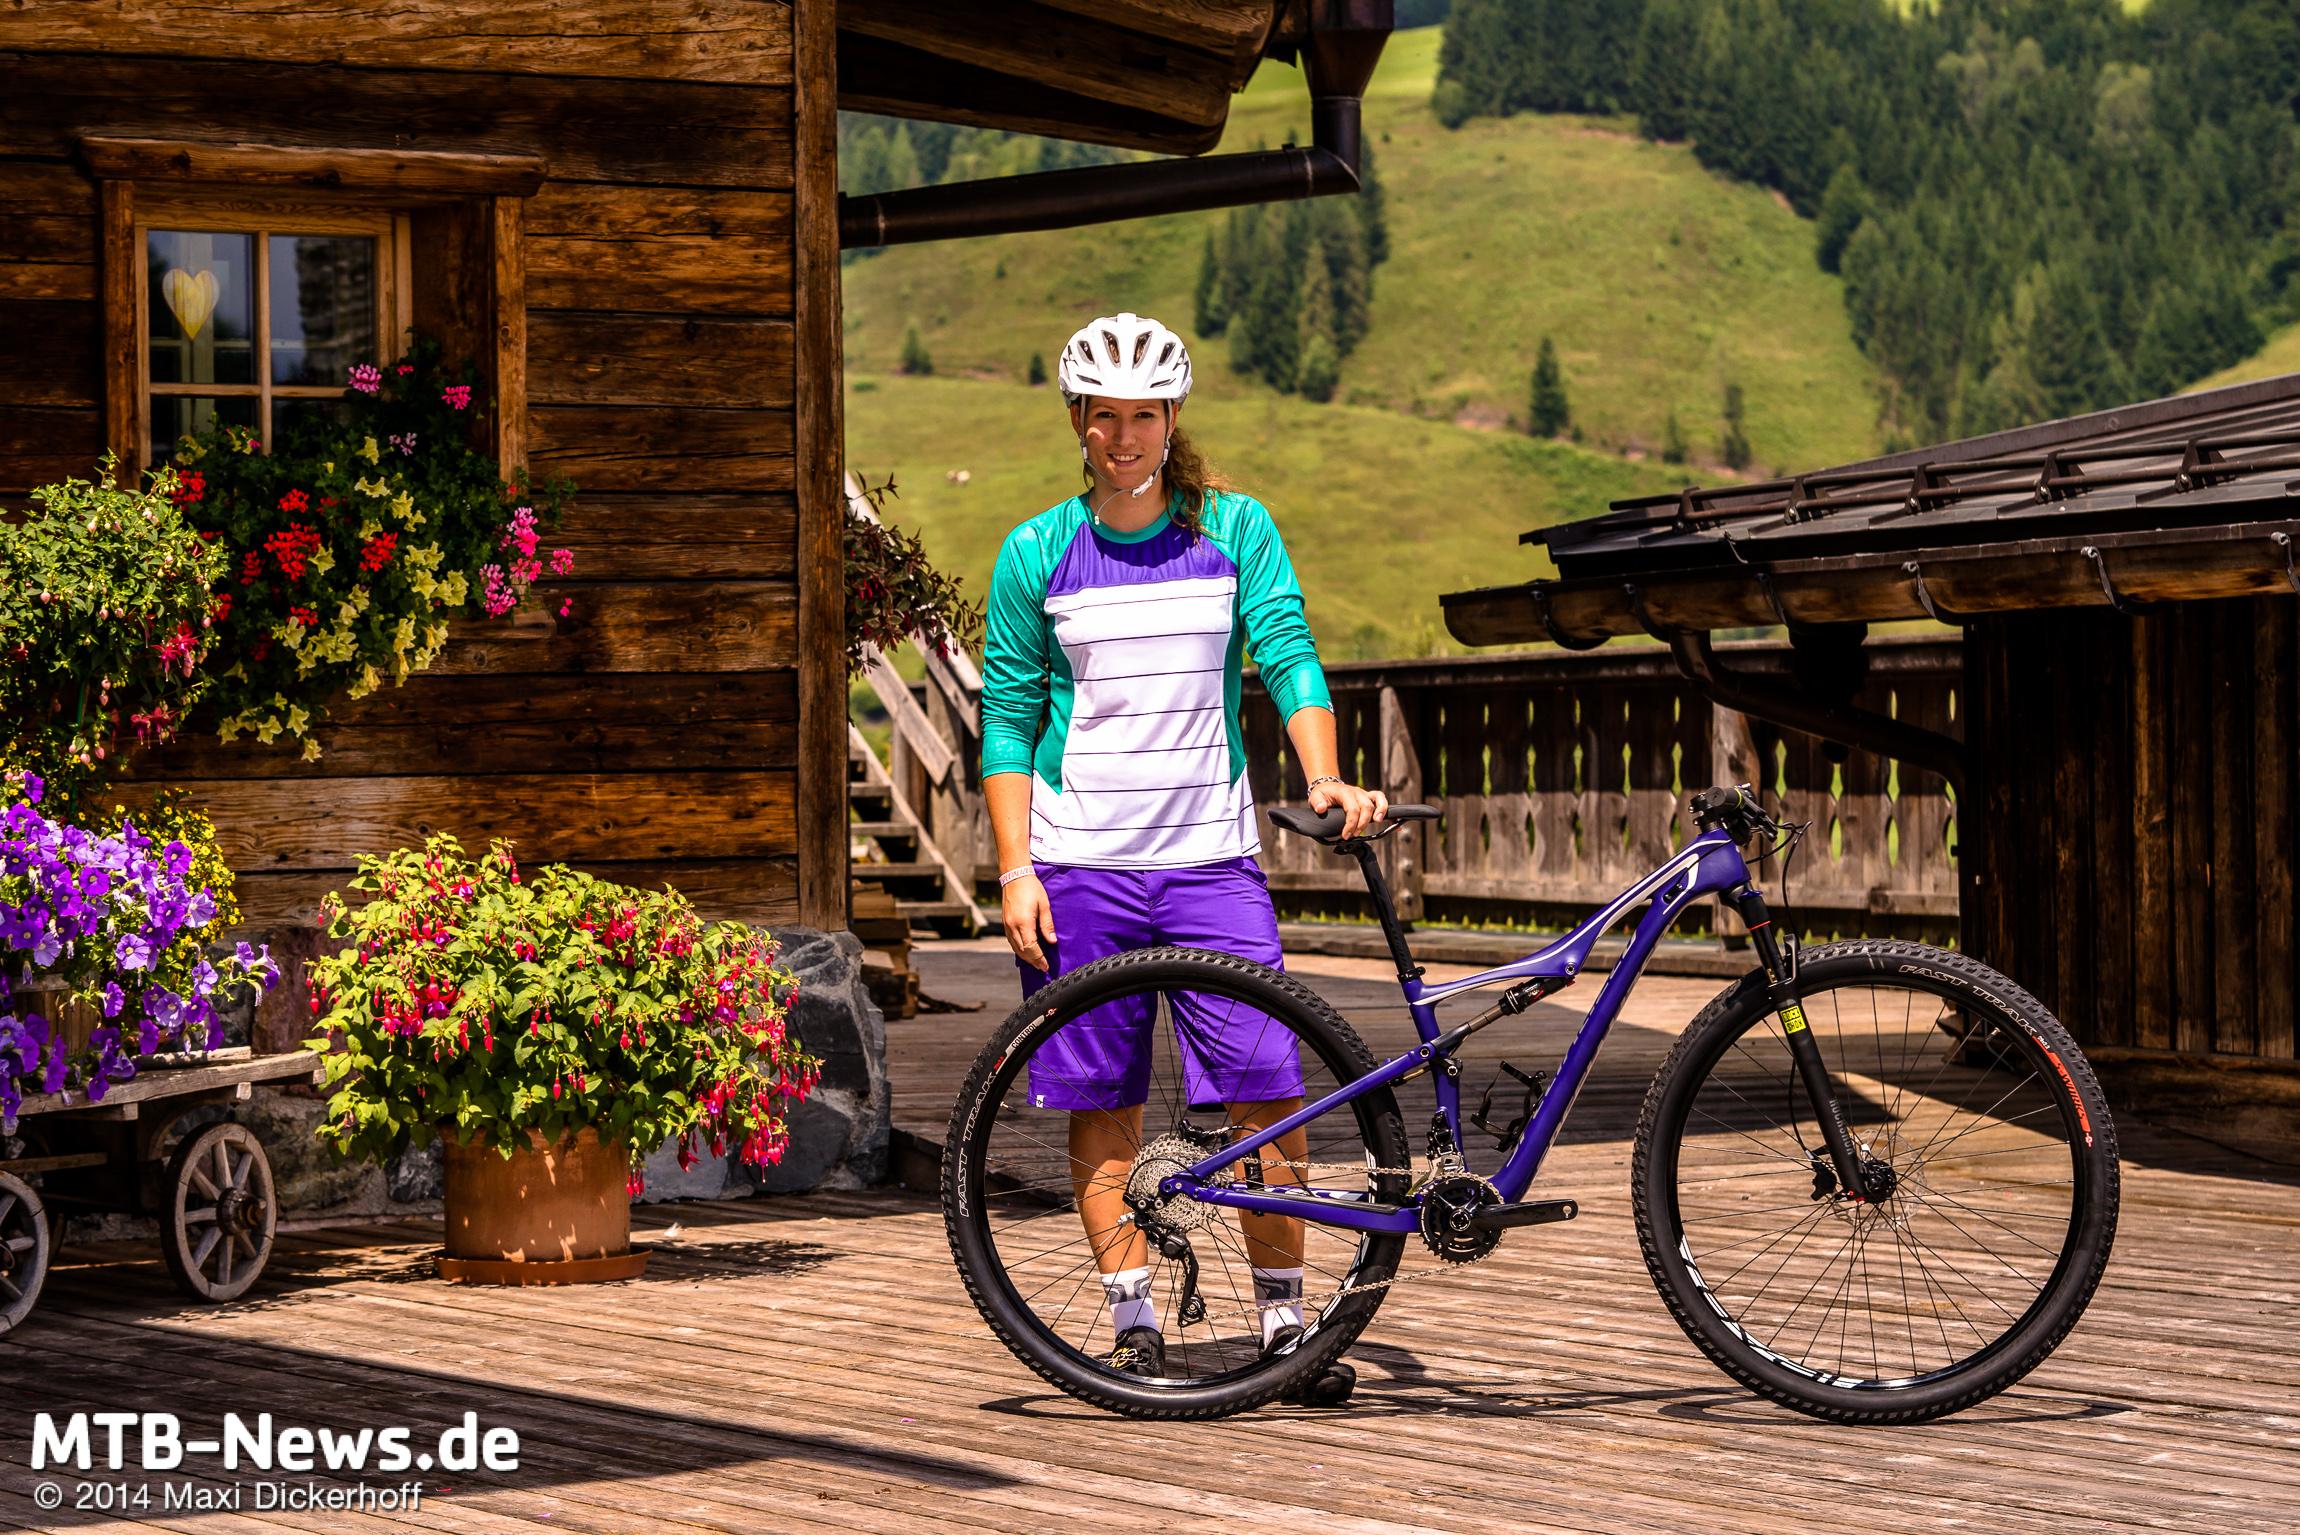 test specialized frauen bikes 2015 rumor evo und era carbon mtb. Black Bedroom Furniture Sets. Home Design Ideas